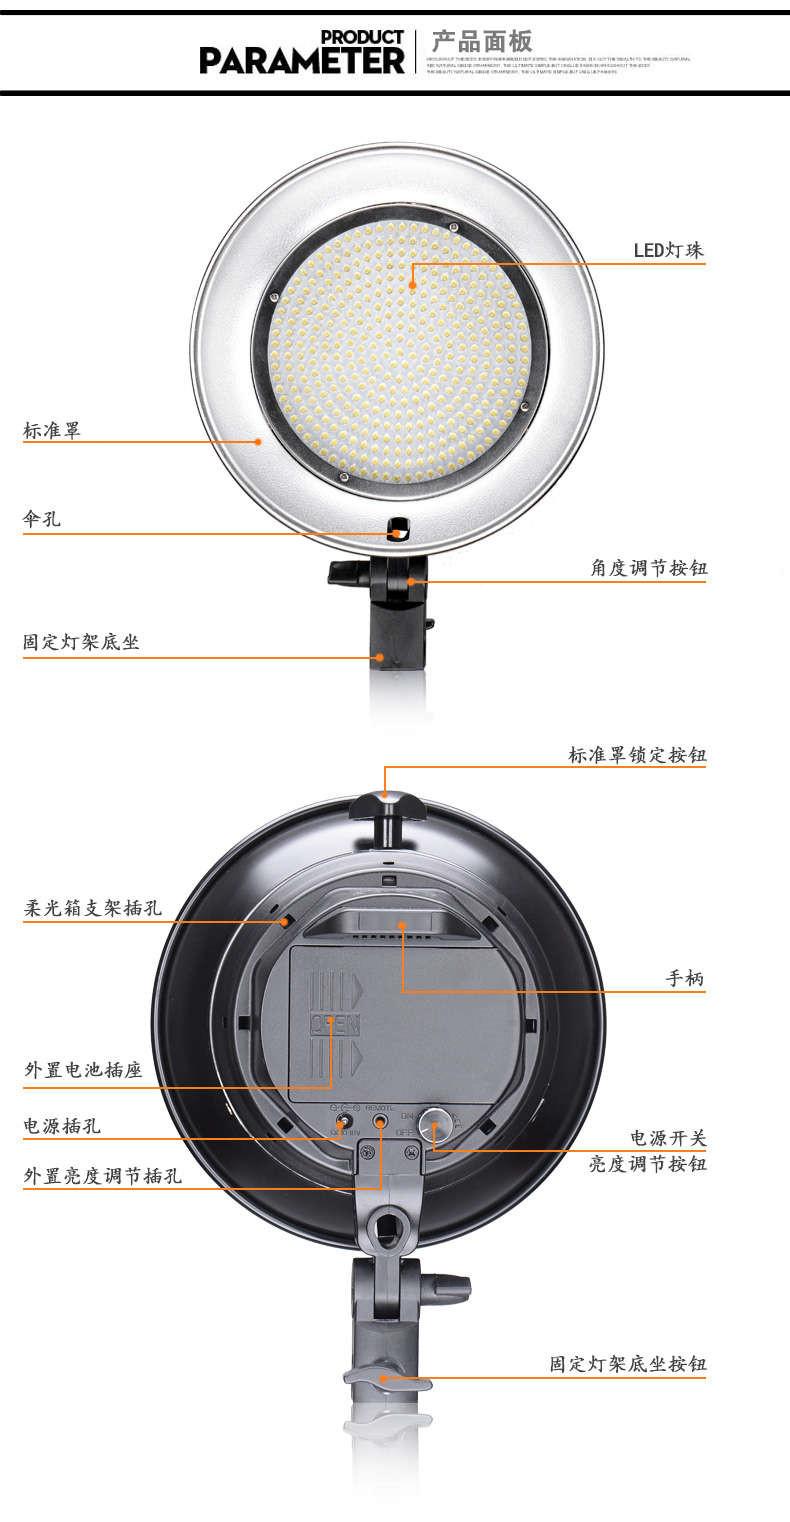 Tolifo图立方PT-VL-380魅影LED摄像补光灯25W(图18)